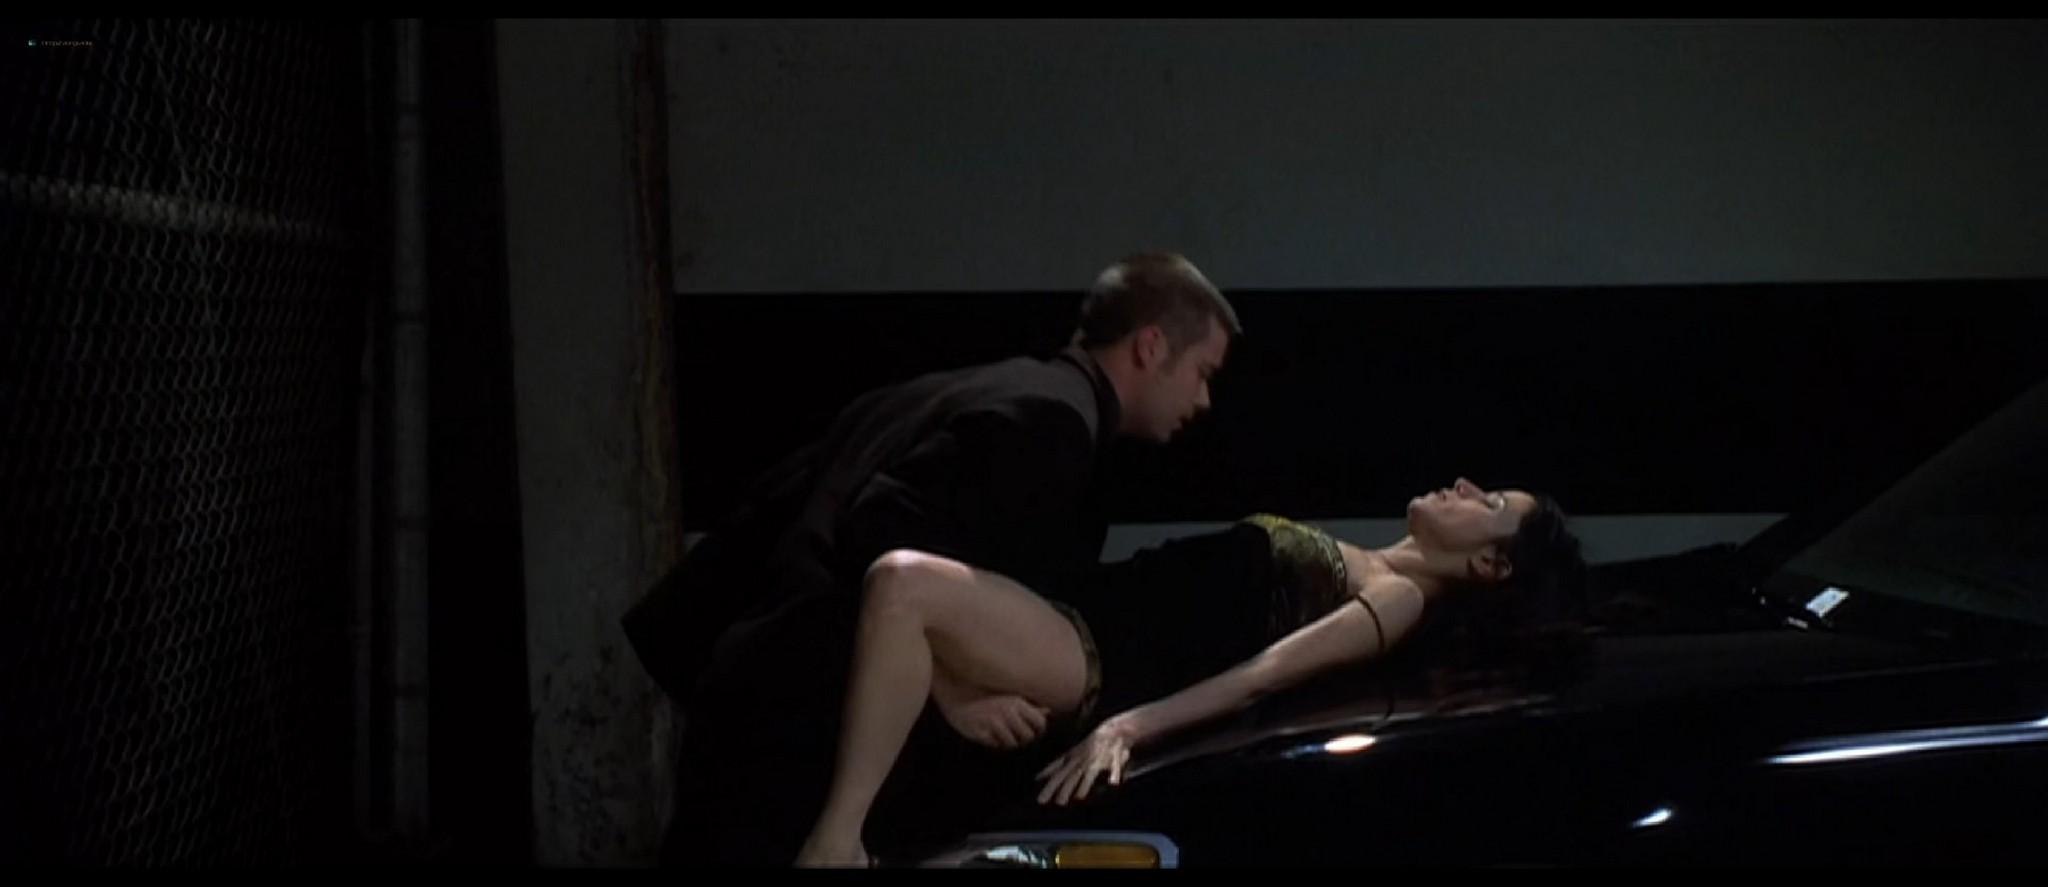 Tara Reid nude hot sex and Emily Procter nude body double - Body Shots (1999) HD 1080p Web (17)